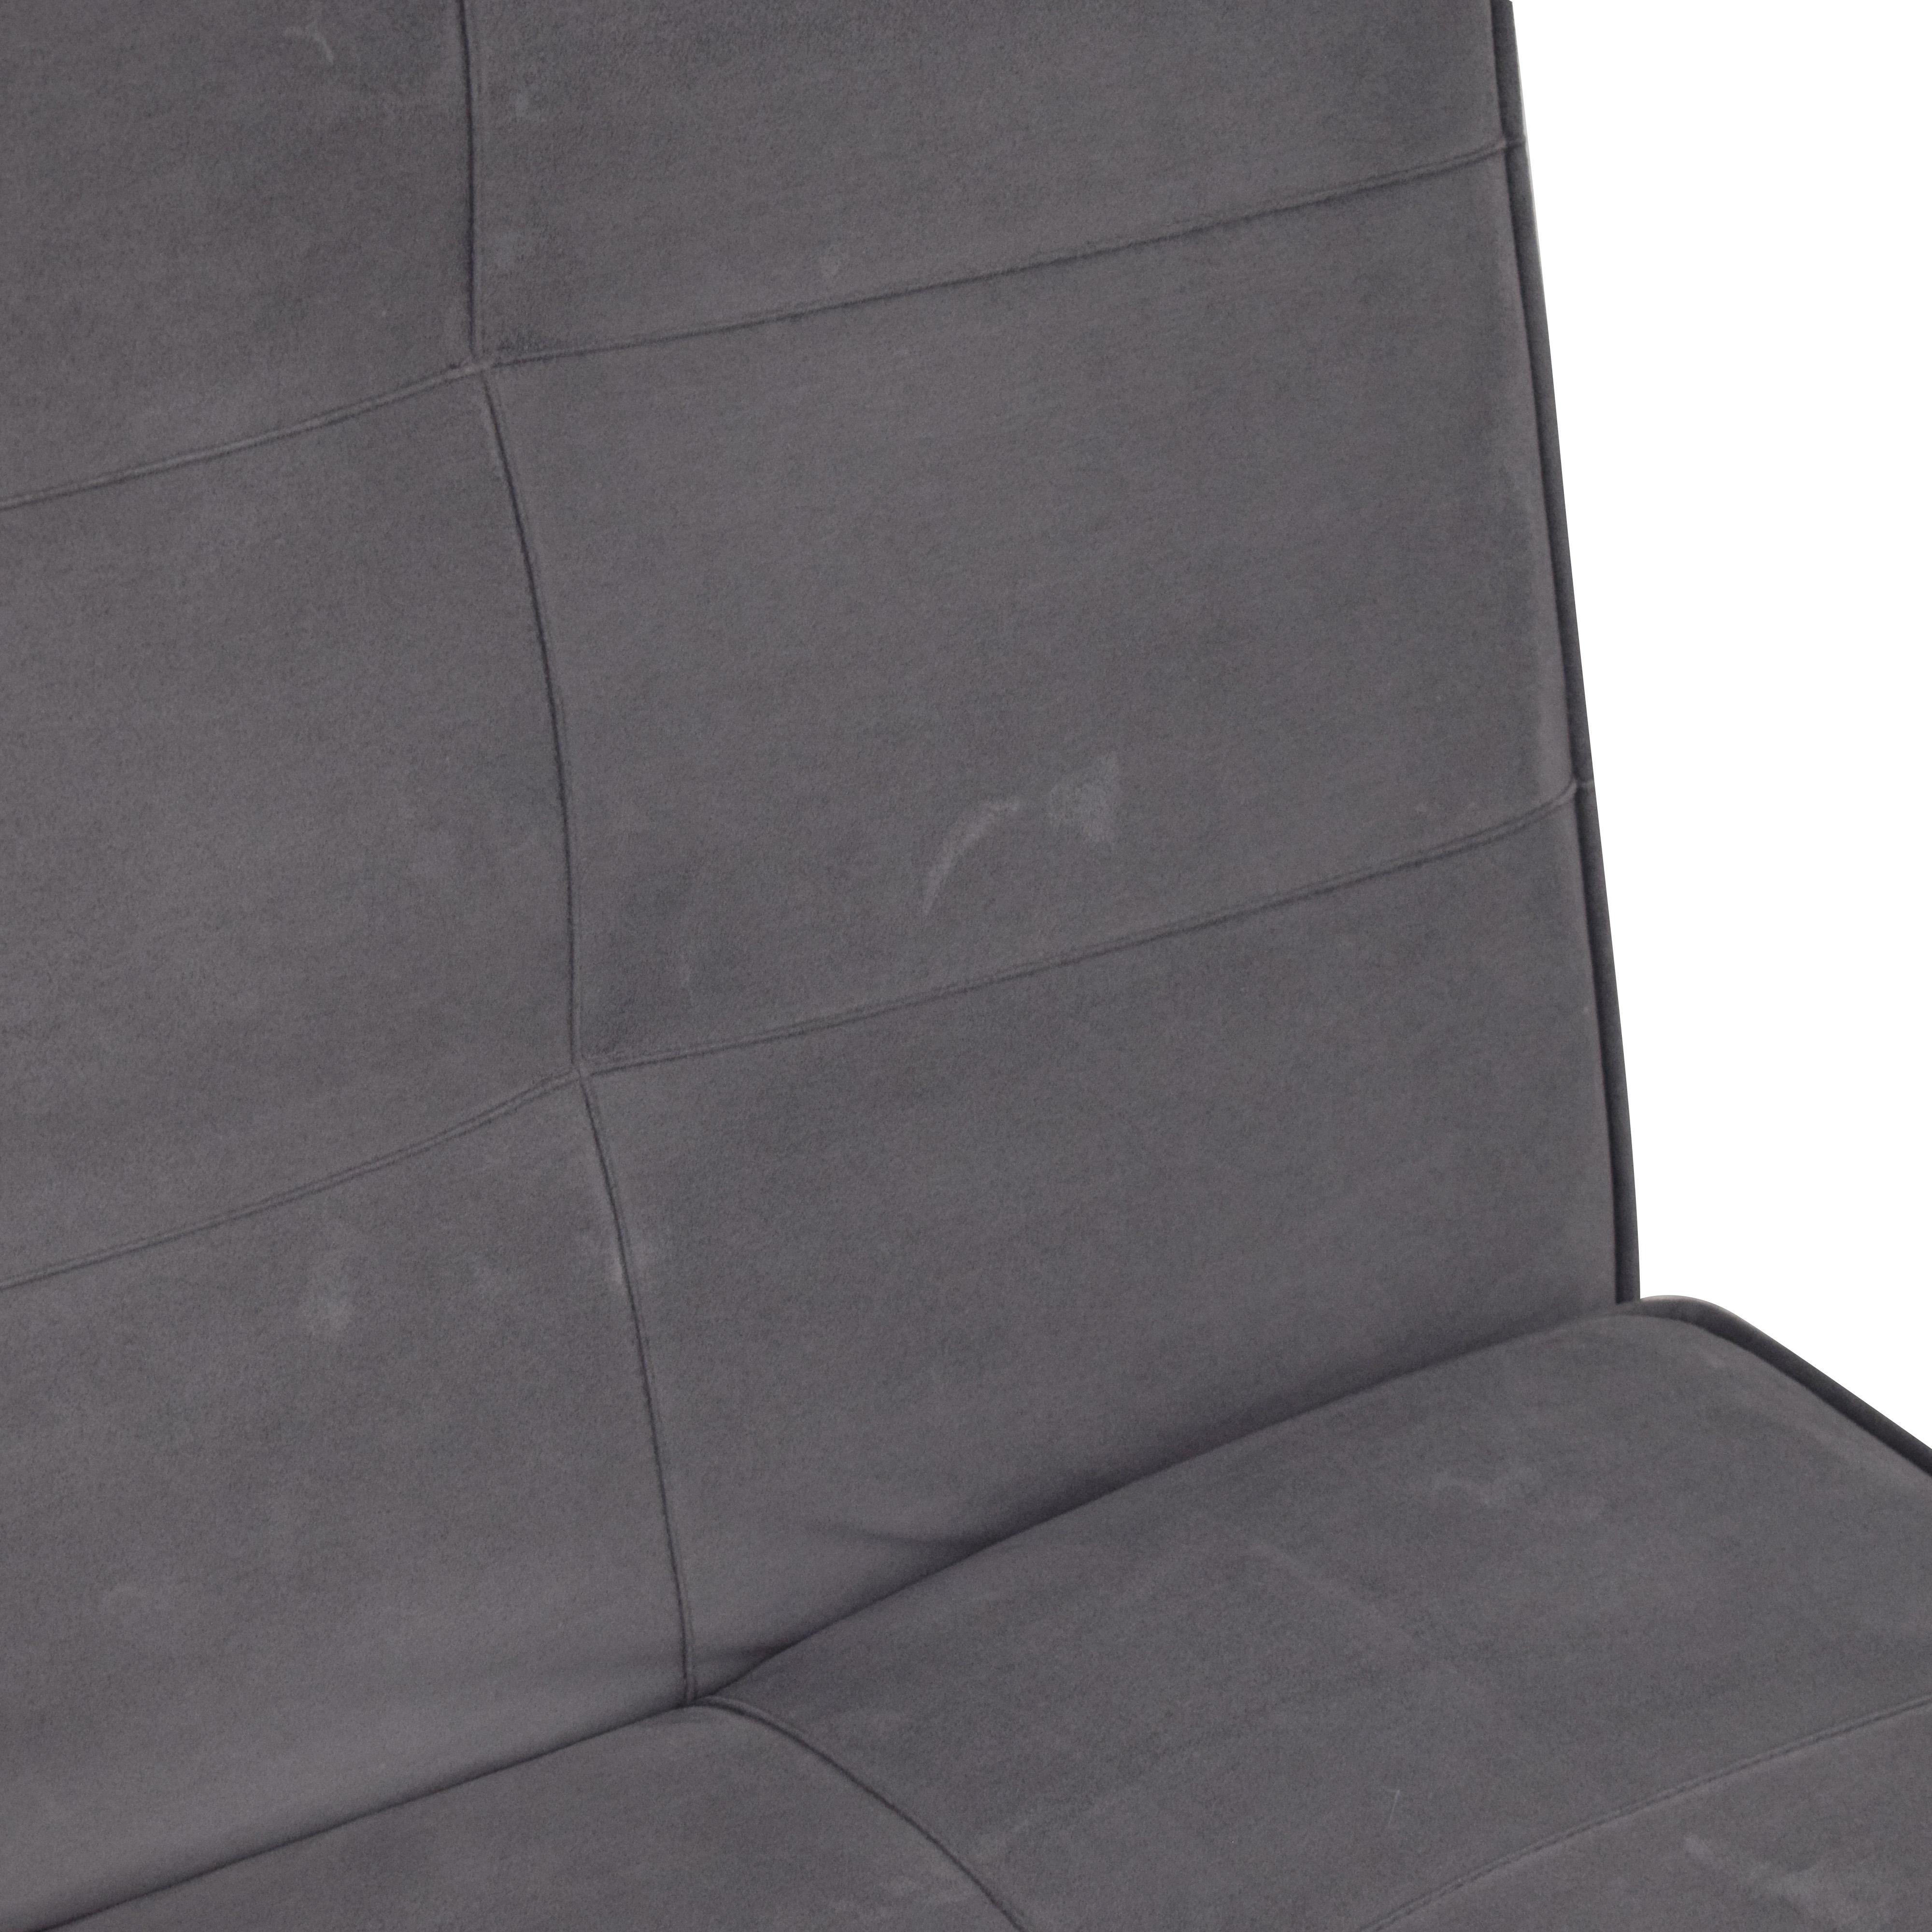 BoConcept BoConcept Sleeper Sofa Bed coupon